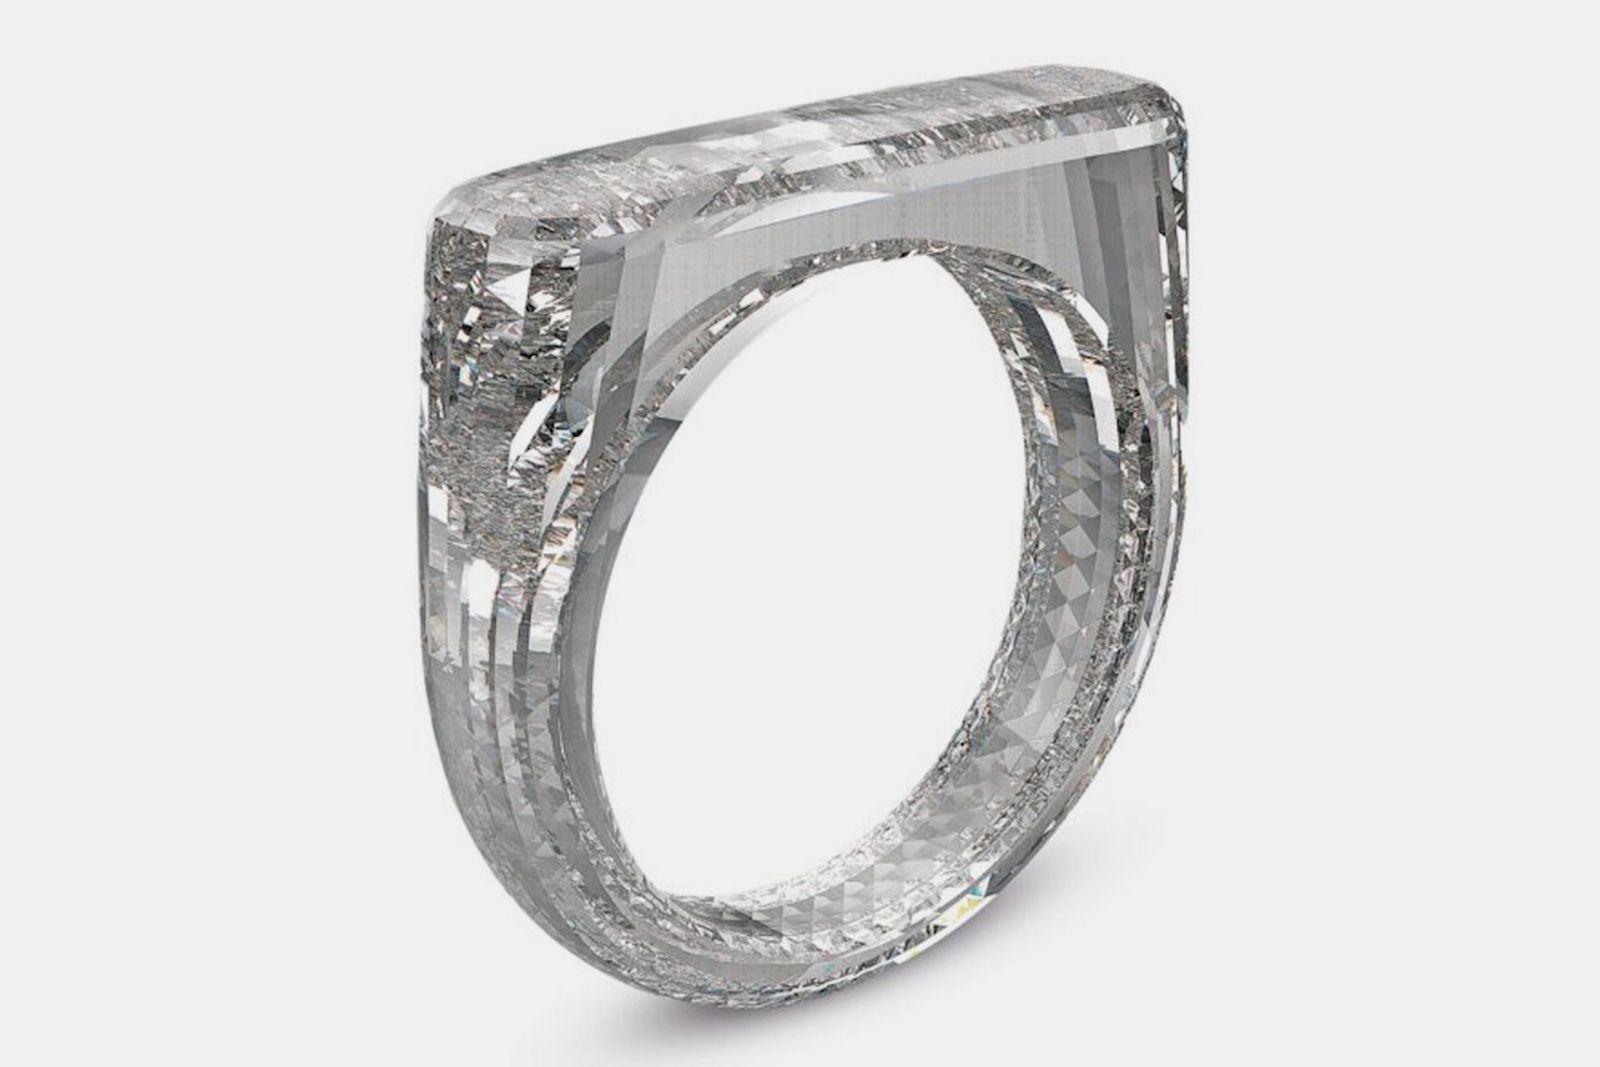 jony ive marc newson diamond ring sothebys Diamond Foundry